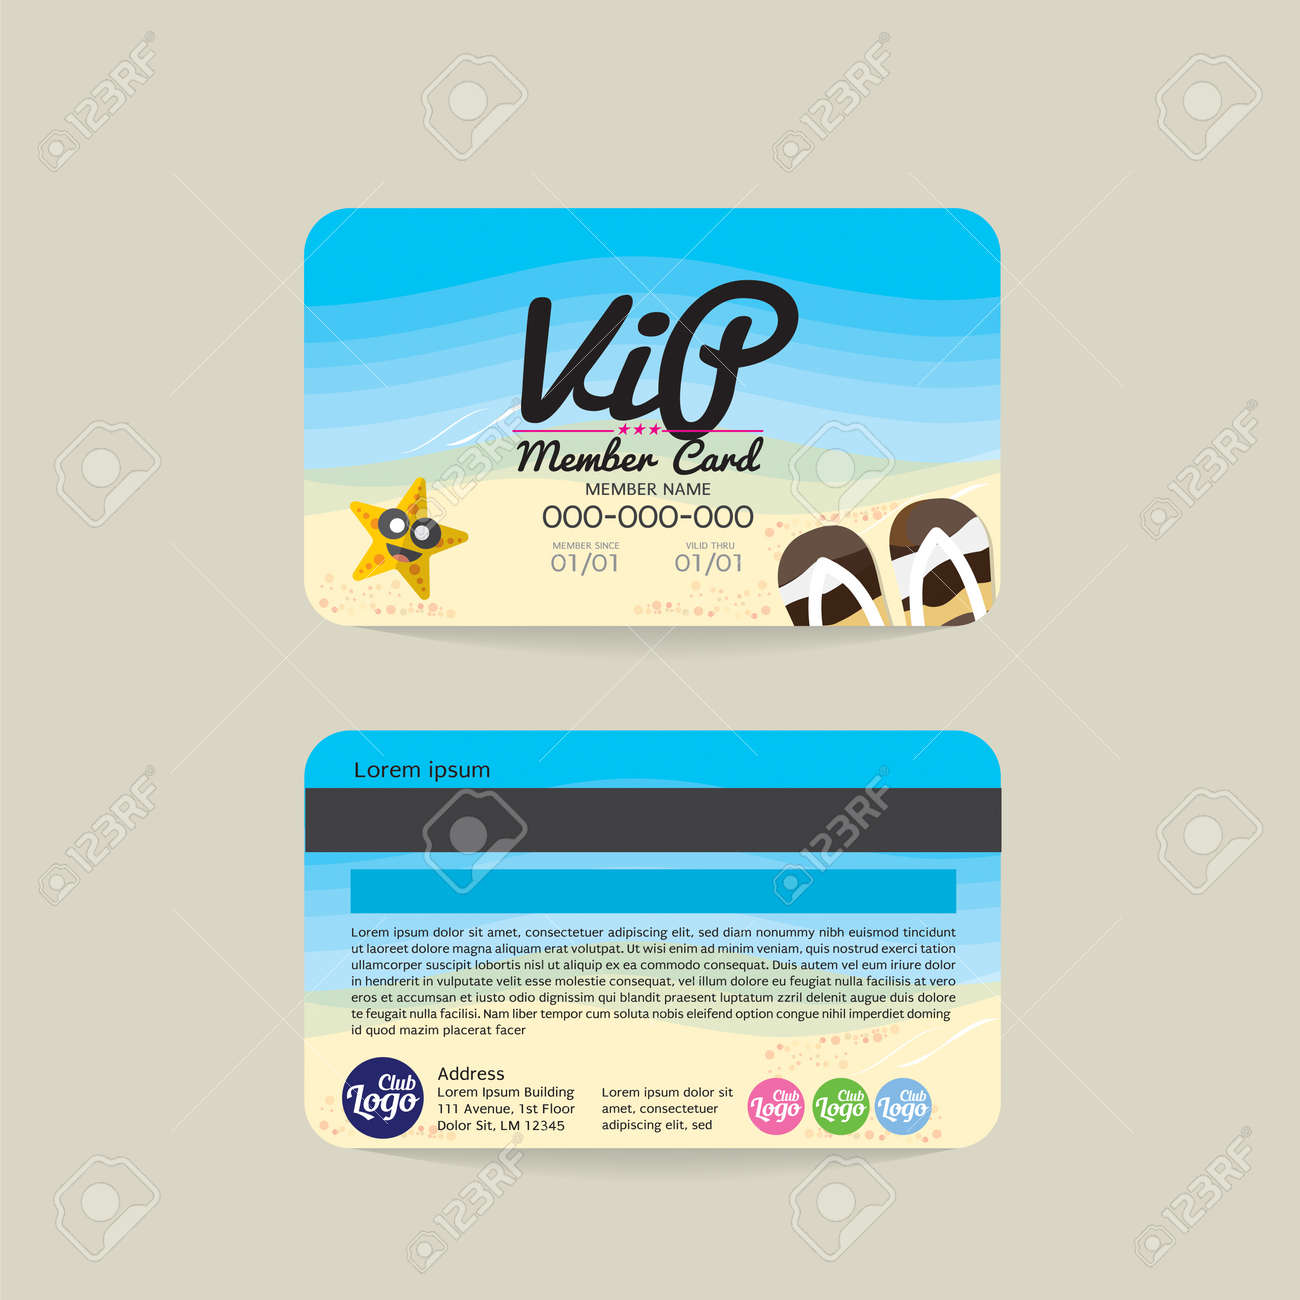 Membership Card Template Word sample cash receipt – Membership Card Template